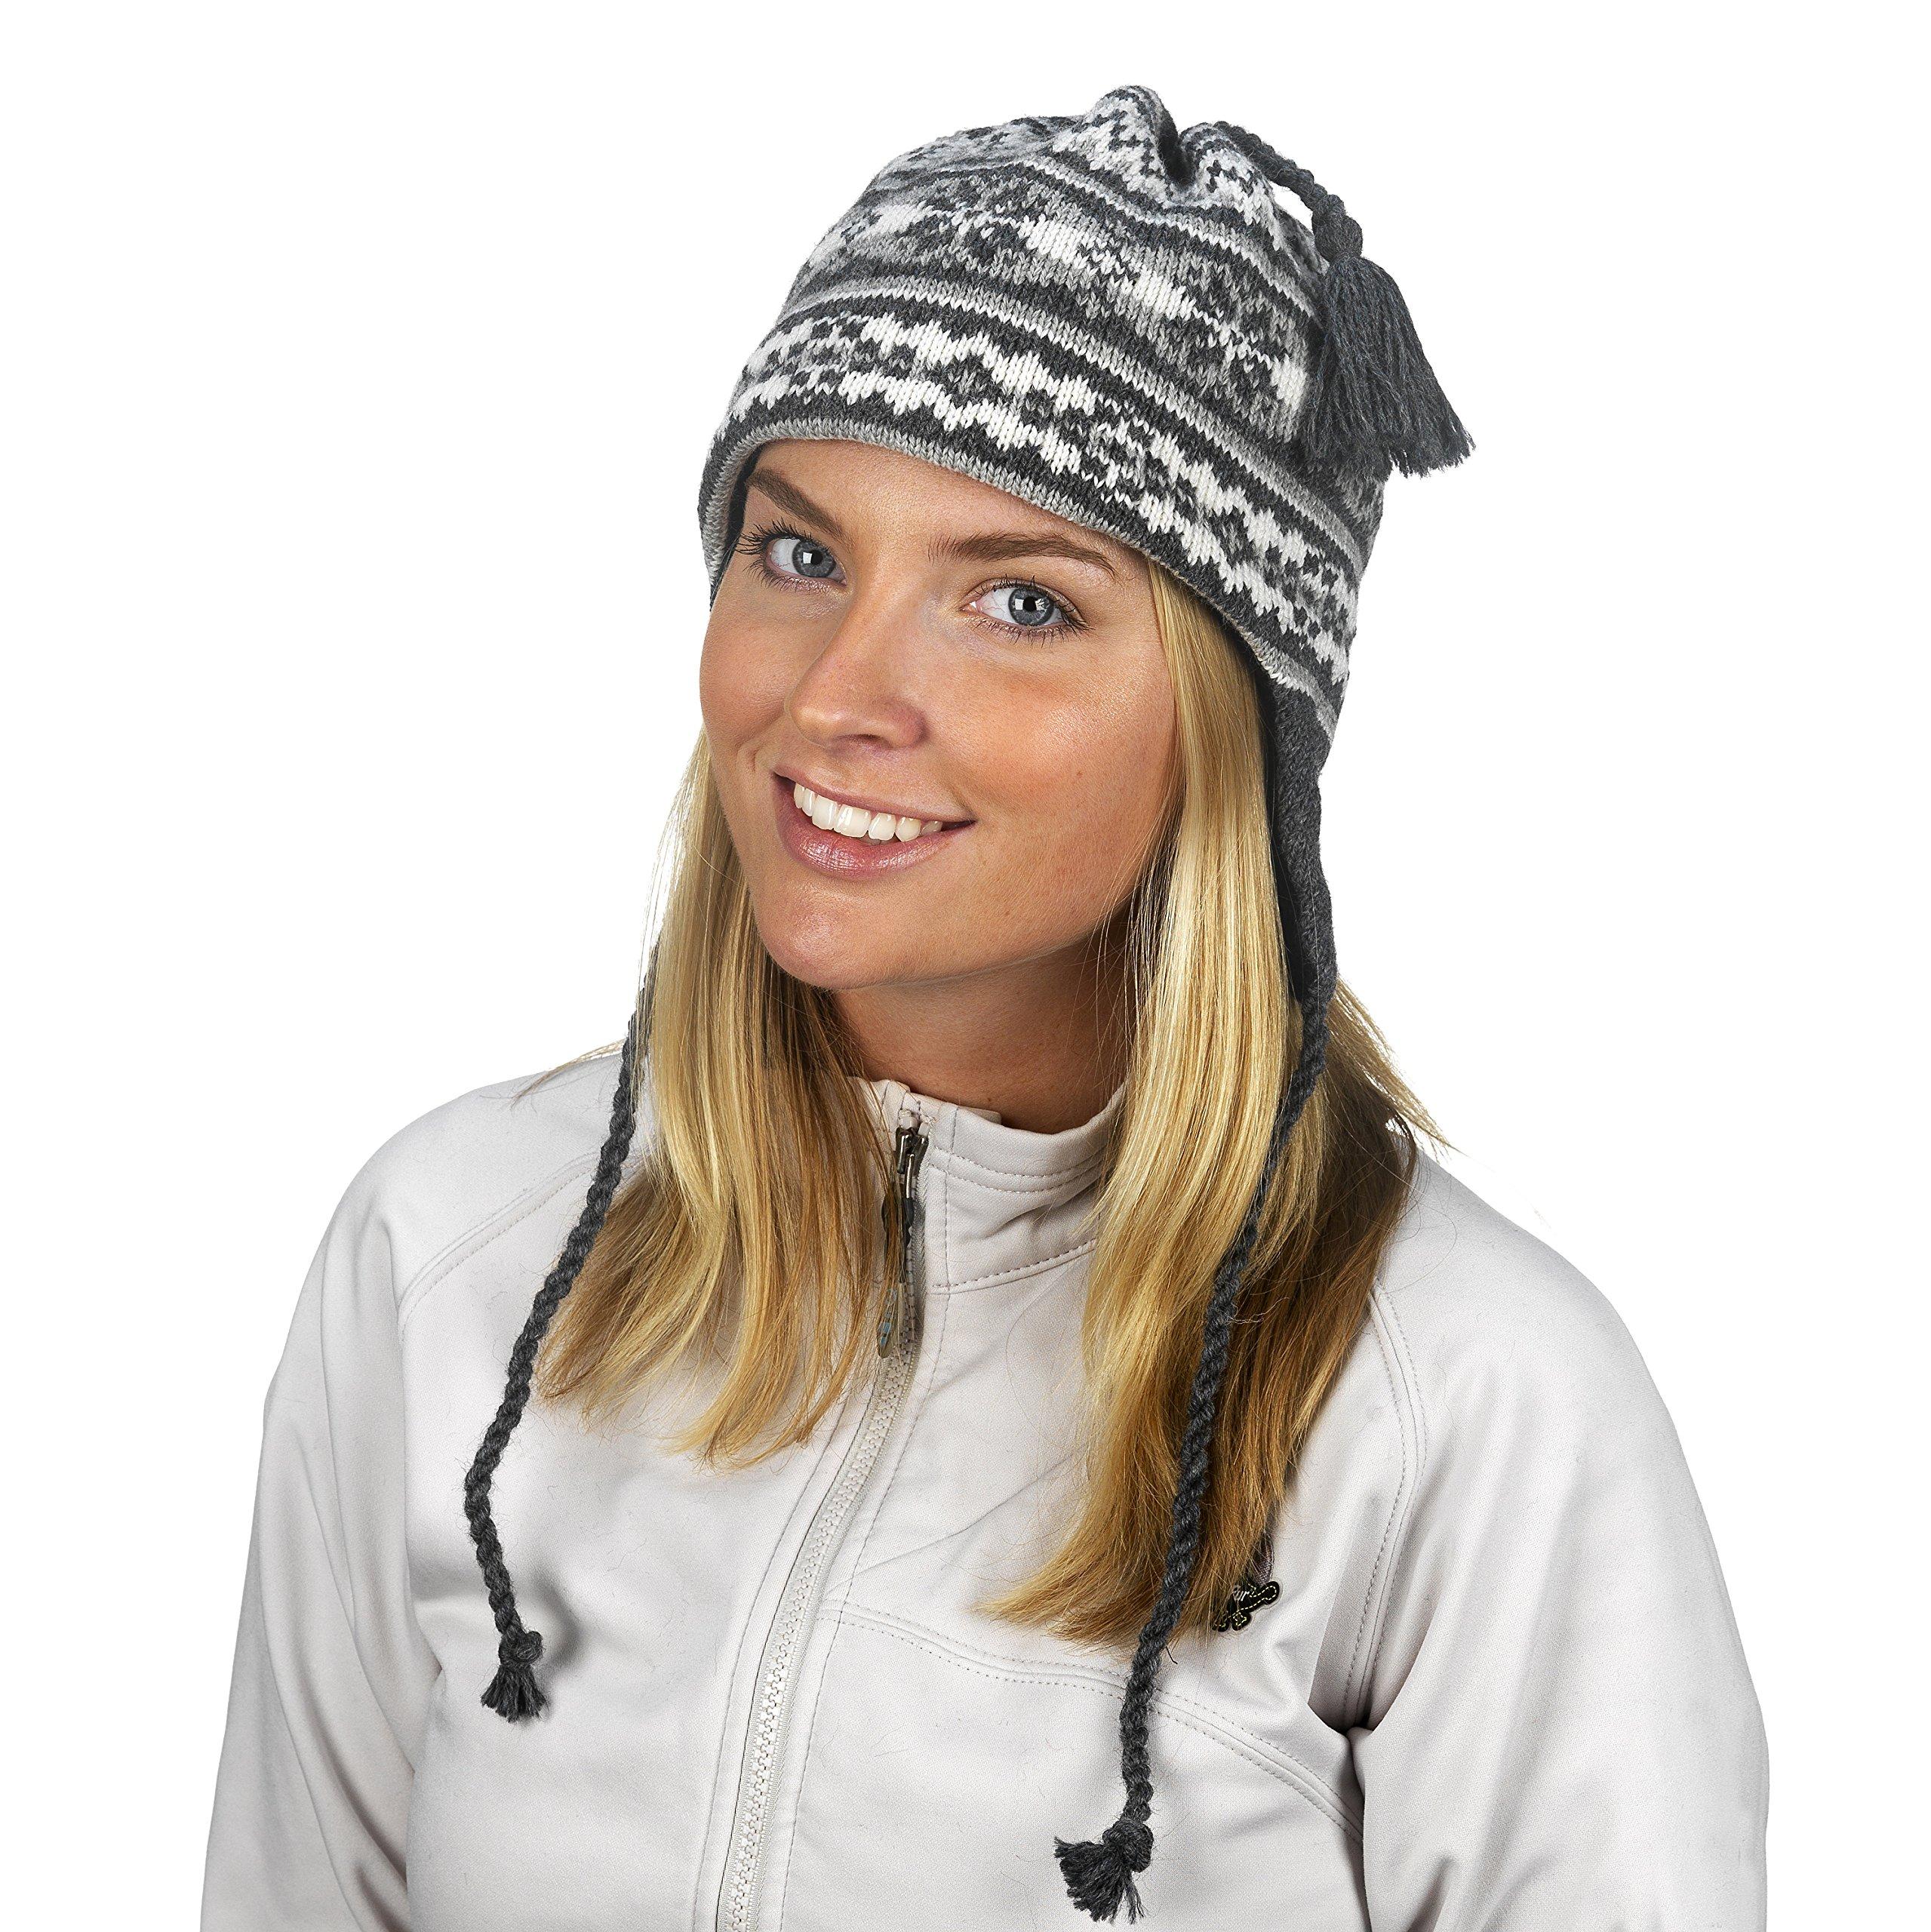 Turtle Fur Women's Nighthorse, Classic Wool Ski Earflap Hat, Charcoal Heather by Turtle Fur (Image #2)